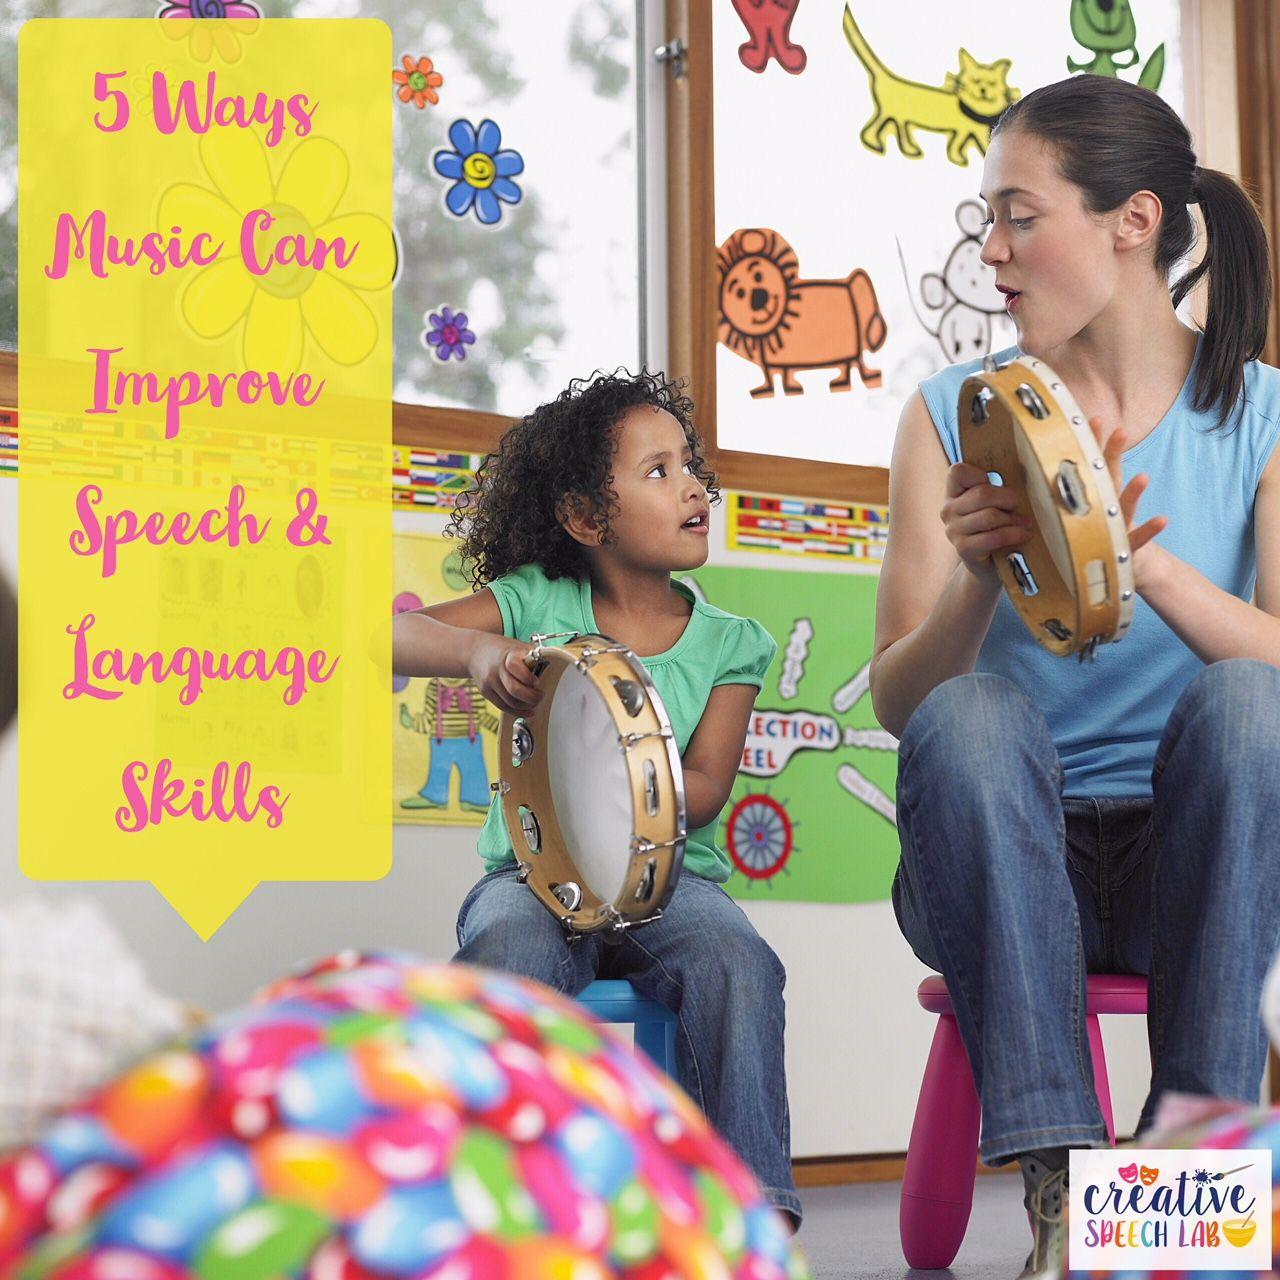 5 Ways Music Can Improve Speech & Language Skills